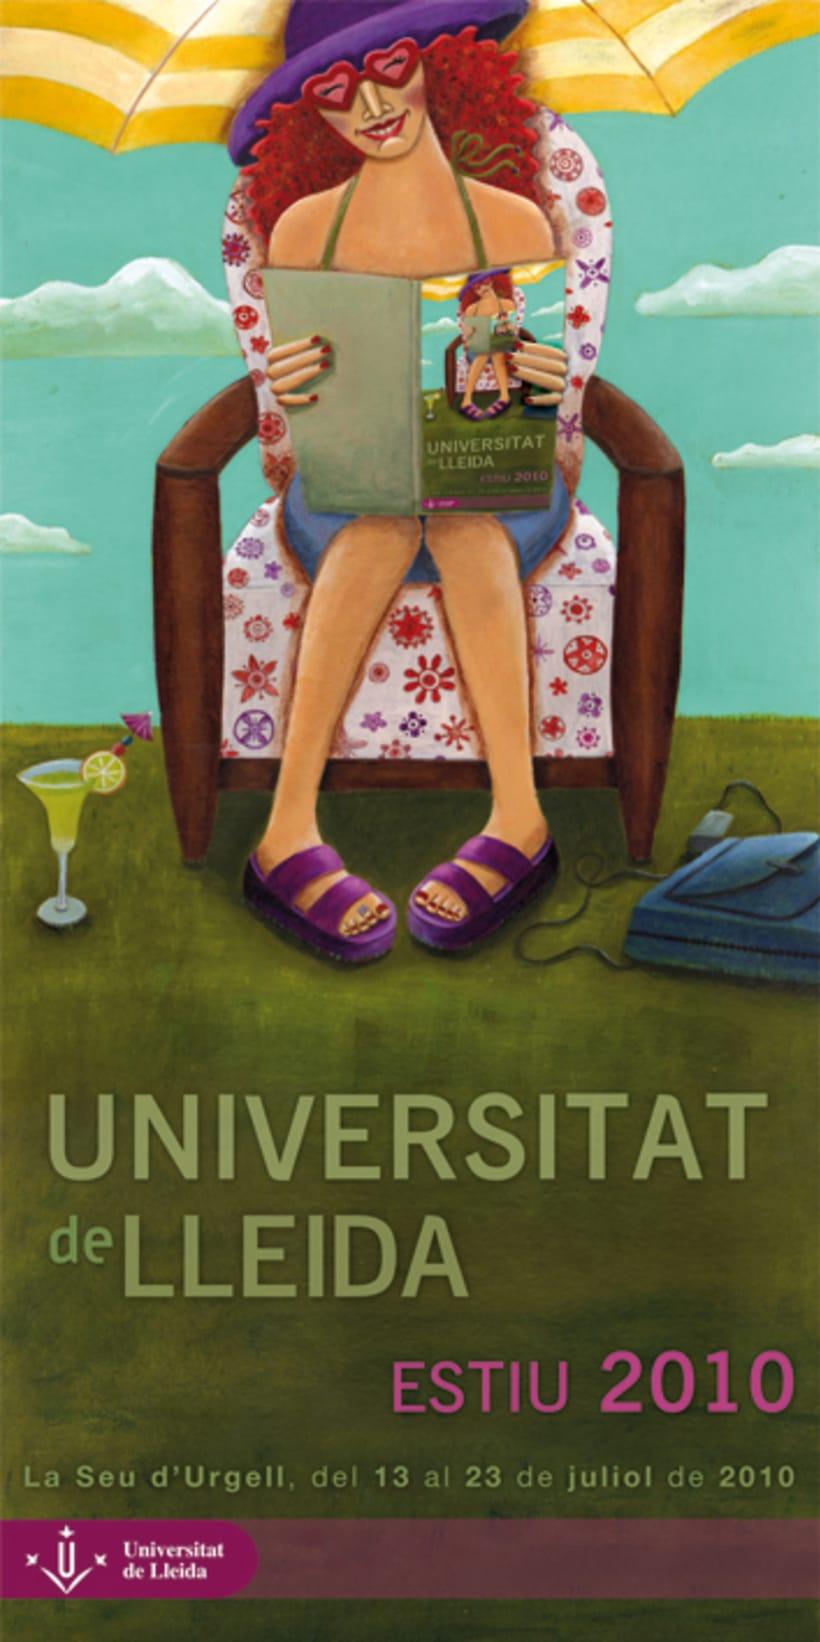 Obra seleccionada cartel Universitat de Lleida cursos verano 2010 1